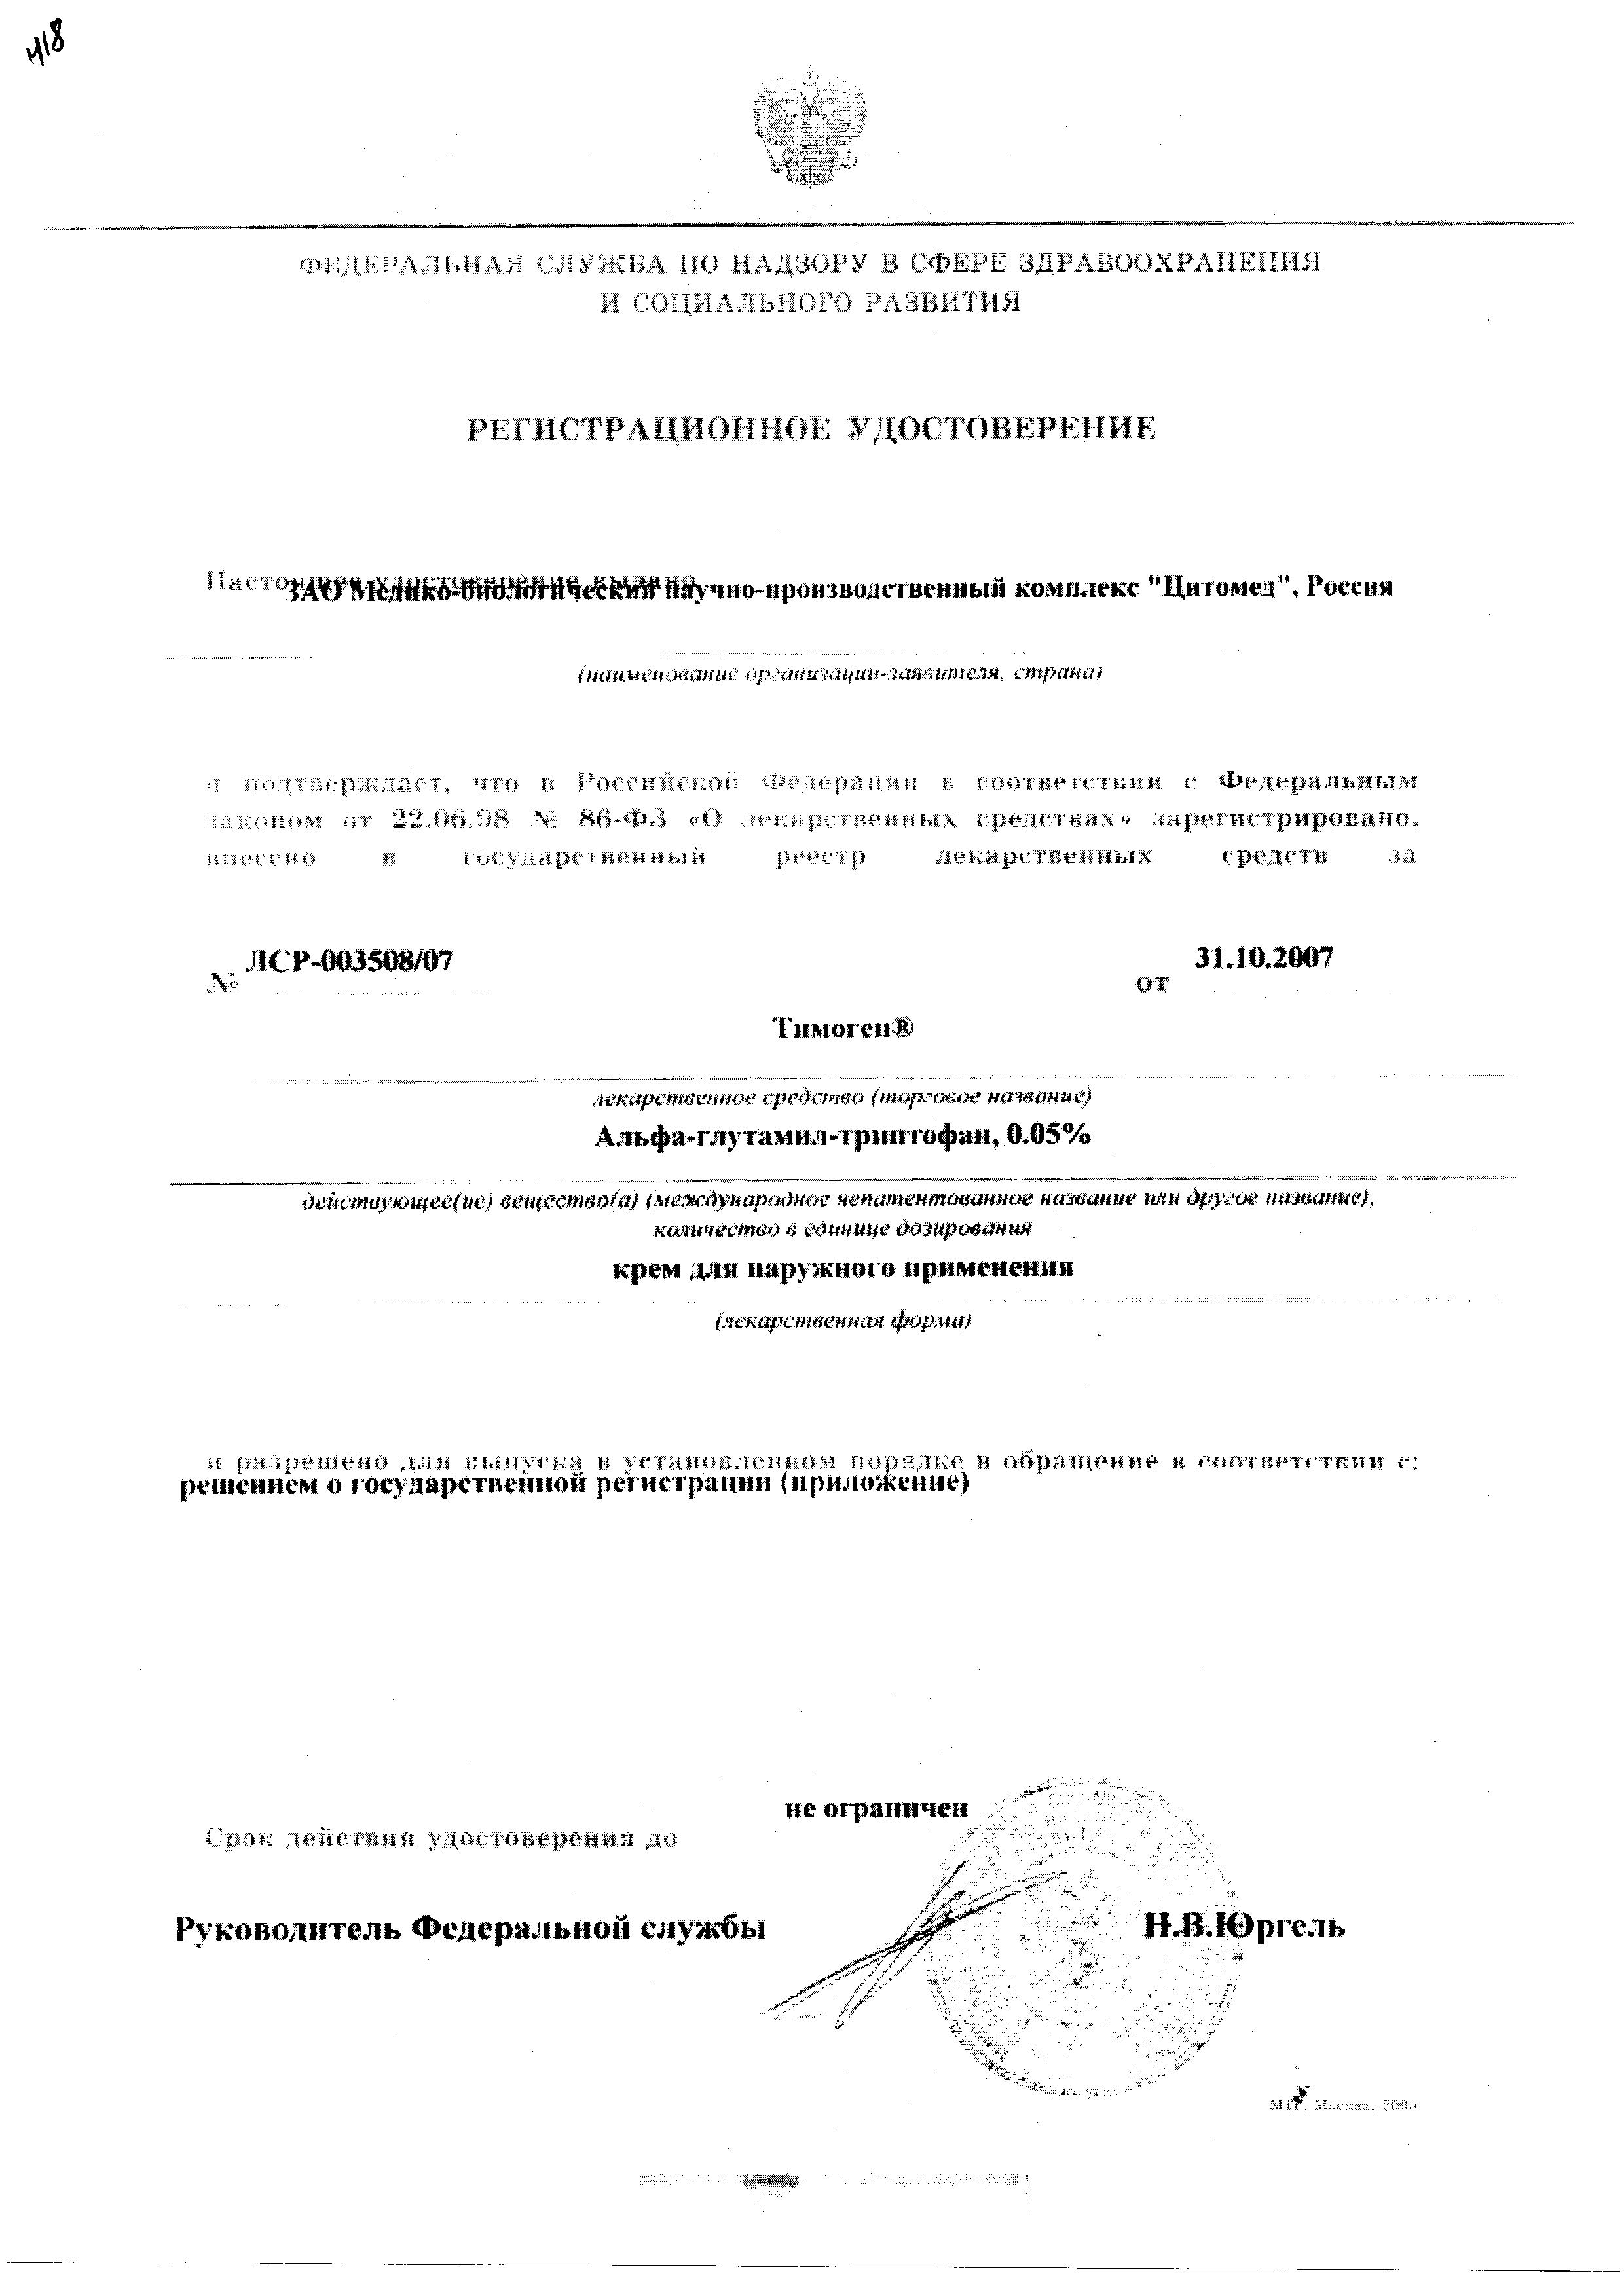 Тимоген (крем) сертификат